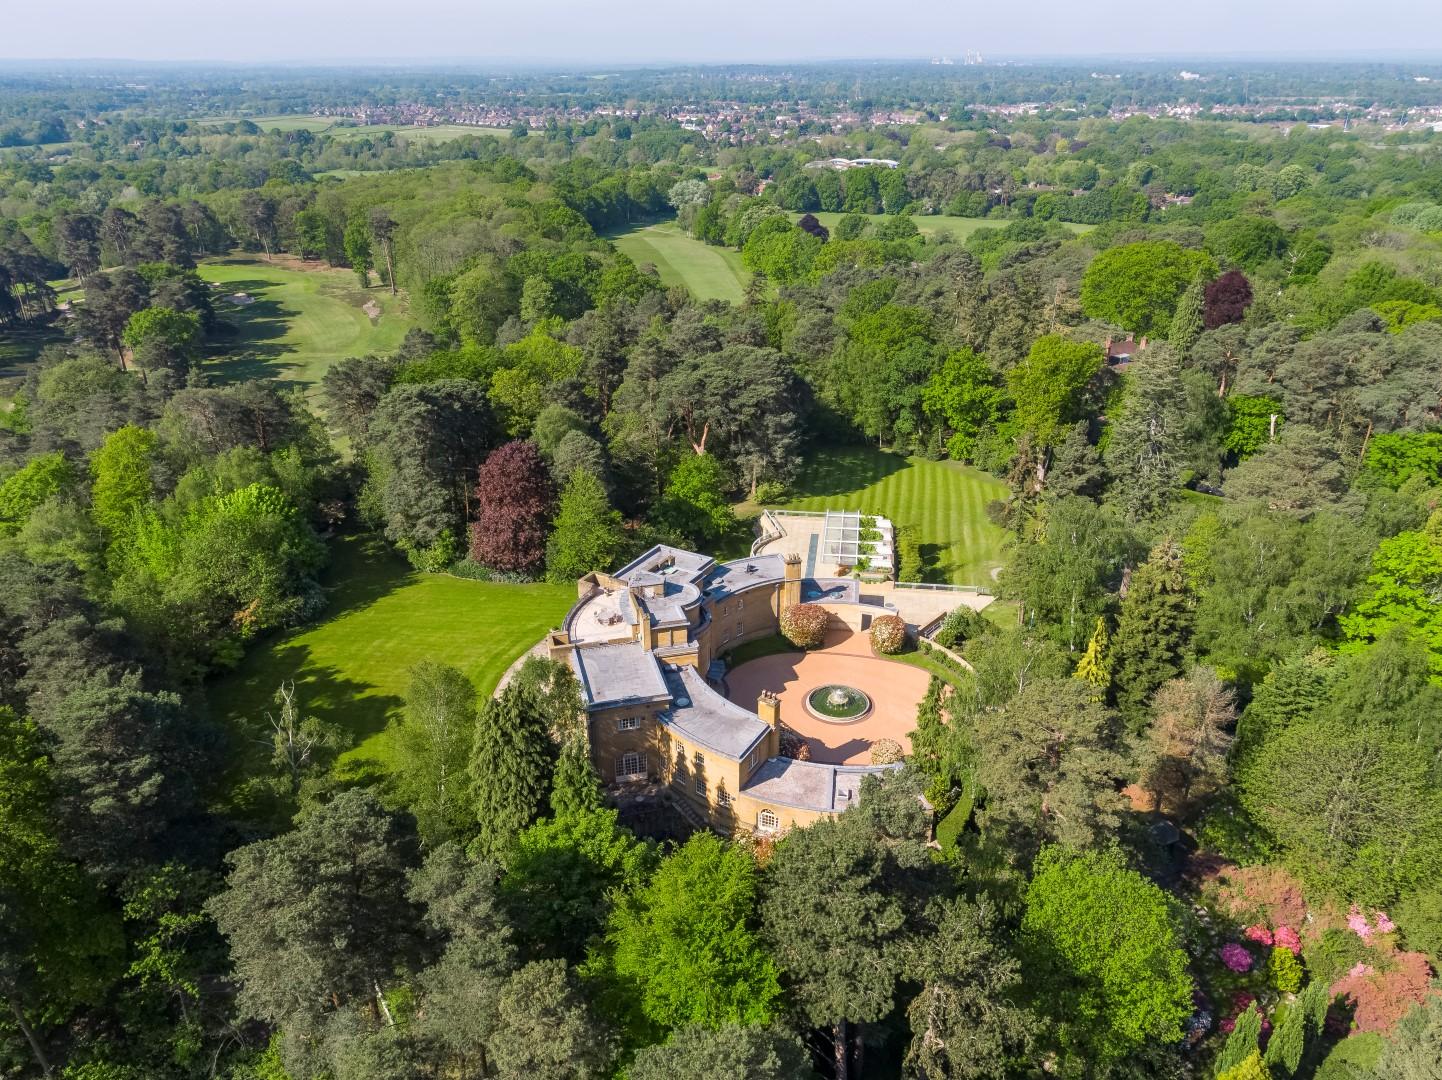 Hamstone-House-South-Ridge-St-Georges-Hill-Weybridge-KT13-0NF-DRONE-76 (Large)